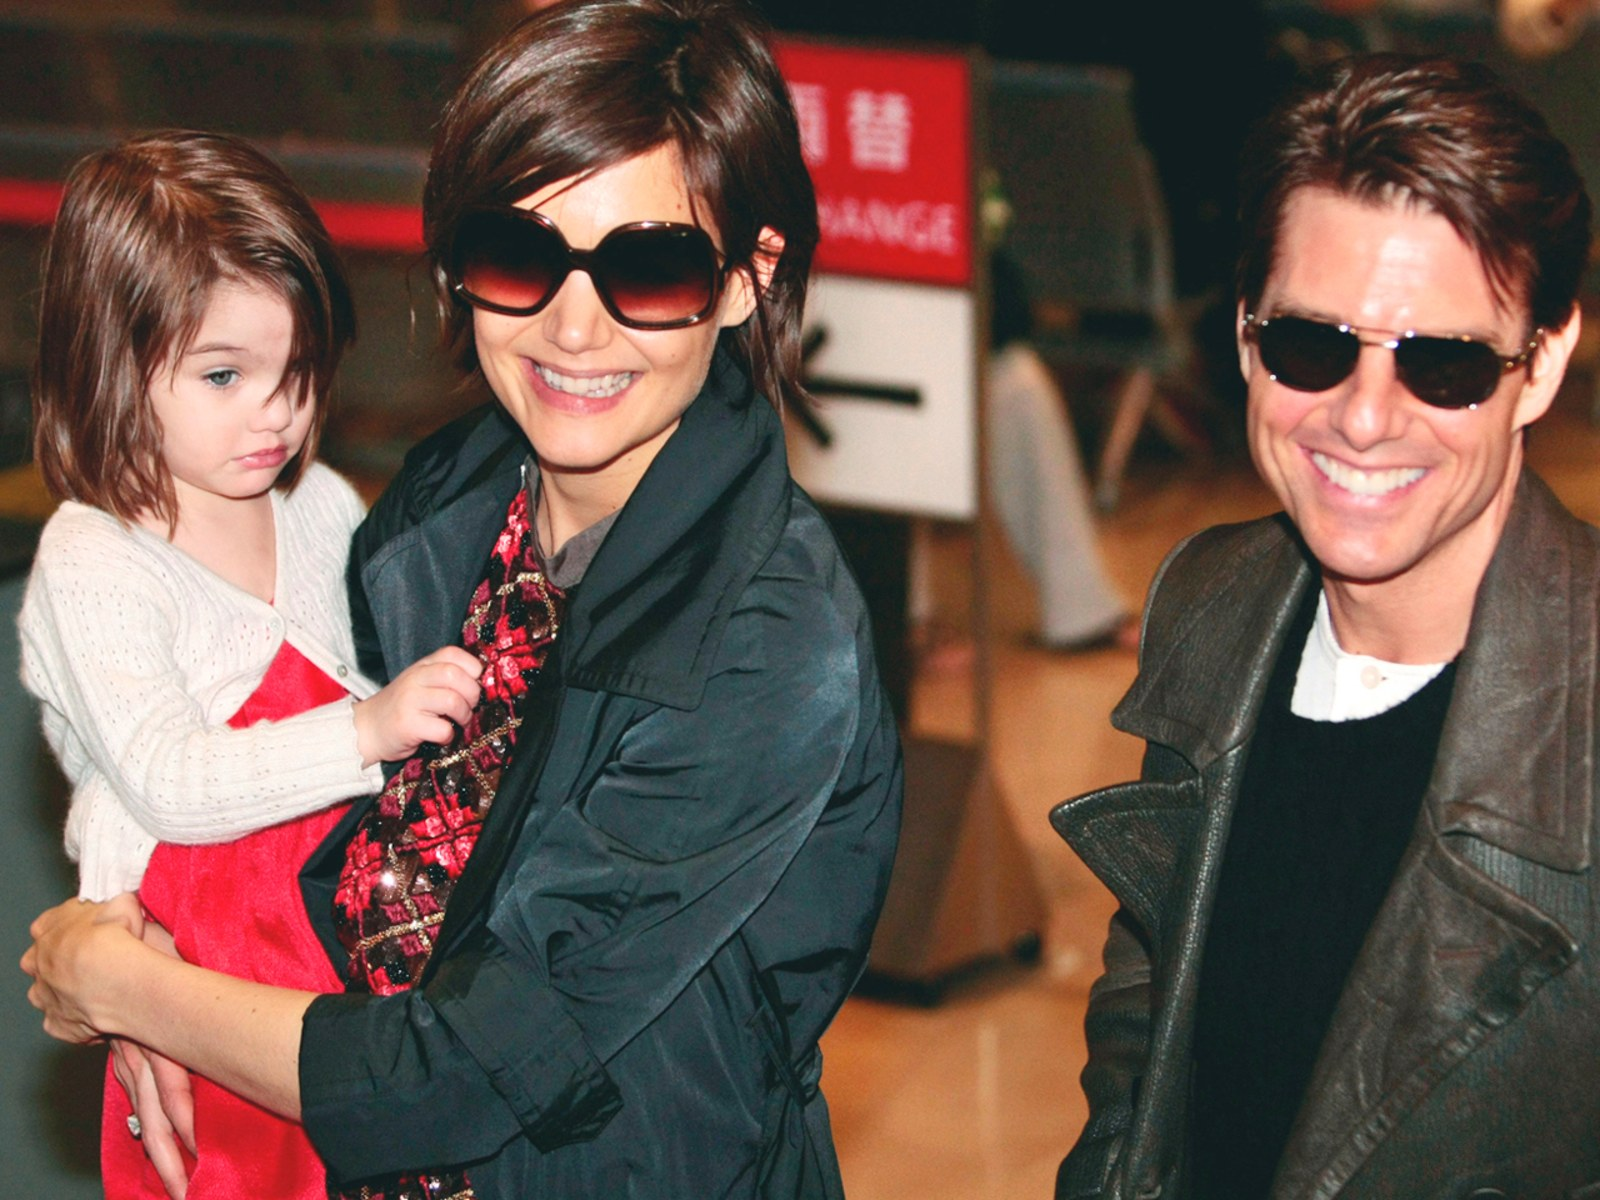 Image: Tom Cruise, Katie Holmes, Suri